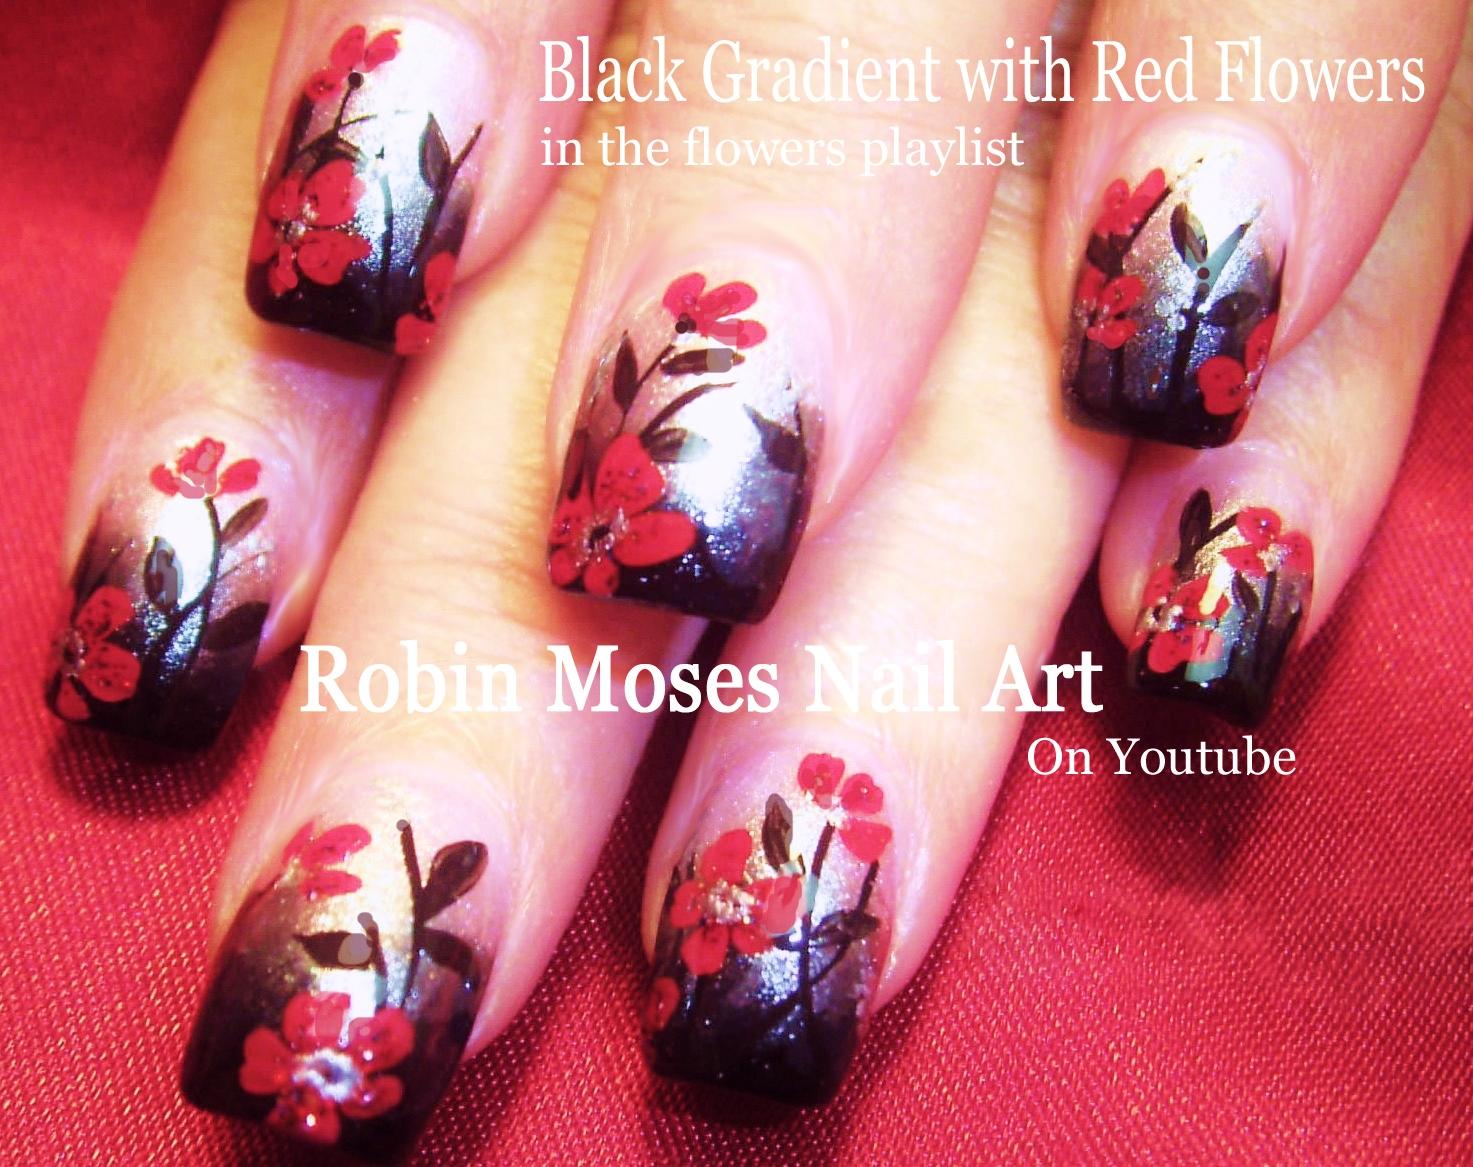 Robin moses nail art september 2015 scary nails playlist dark nail art tutorials diy horror film nail designs and nail ideas for beginners to advanced nail techs prinsesfo Gallery